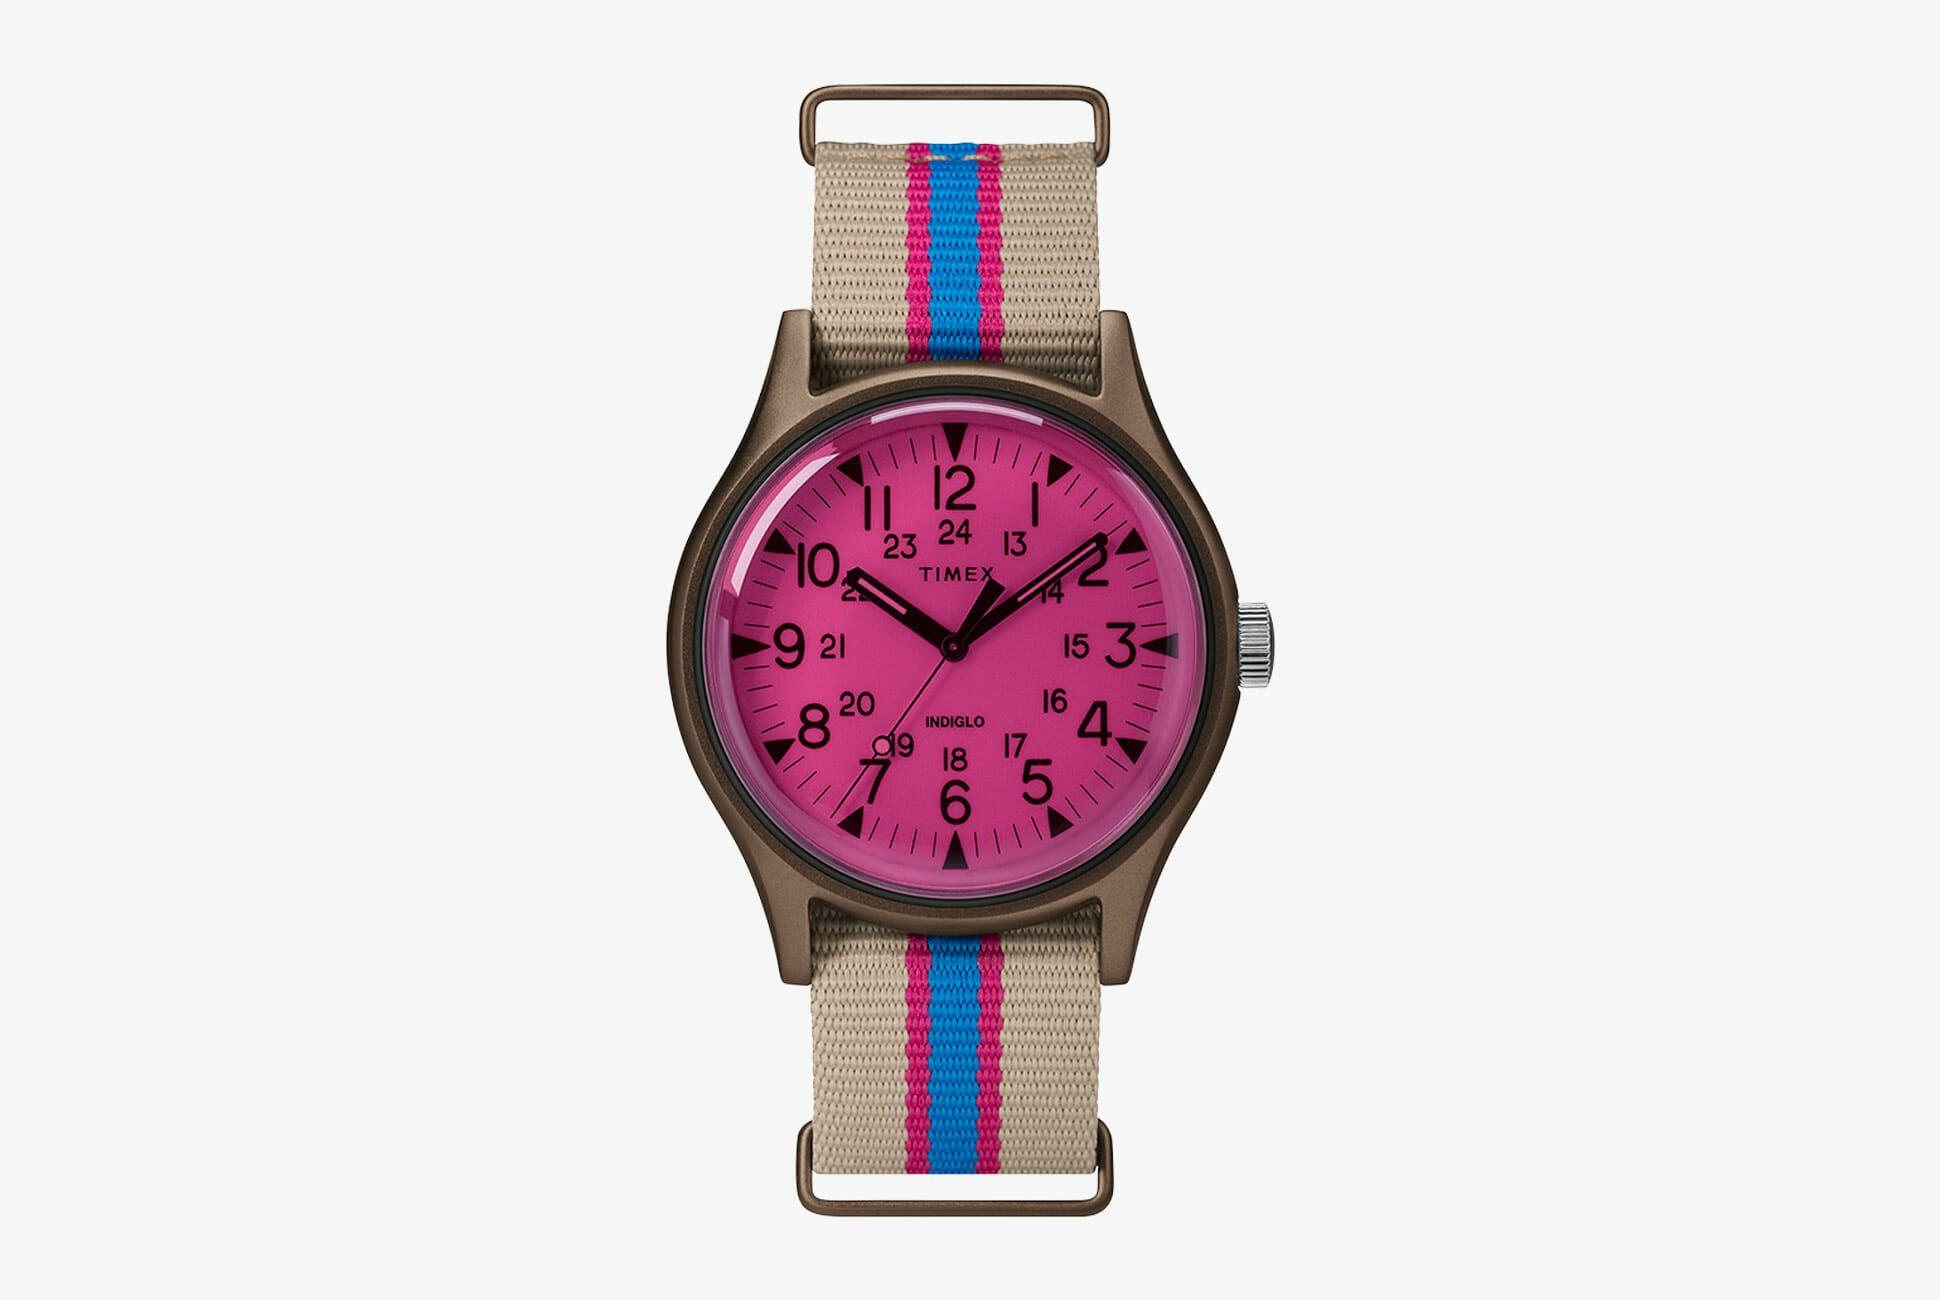 Timex-California-Deal-Gear-Patrol-Slide-4